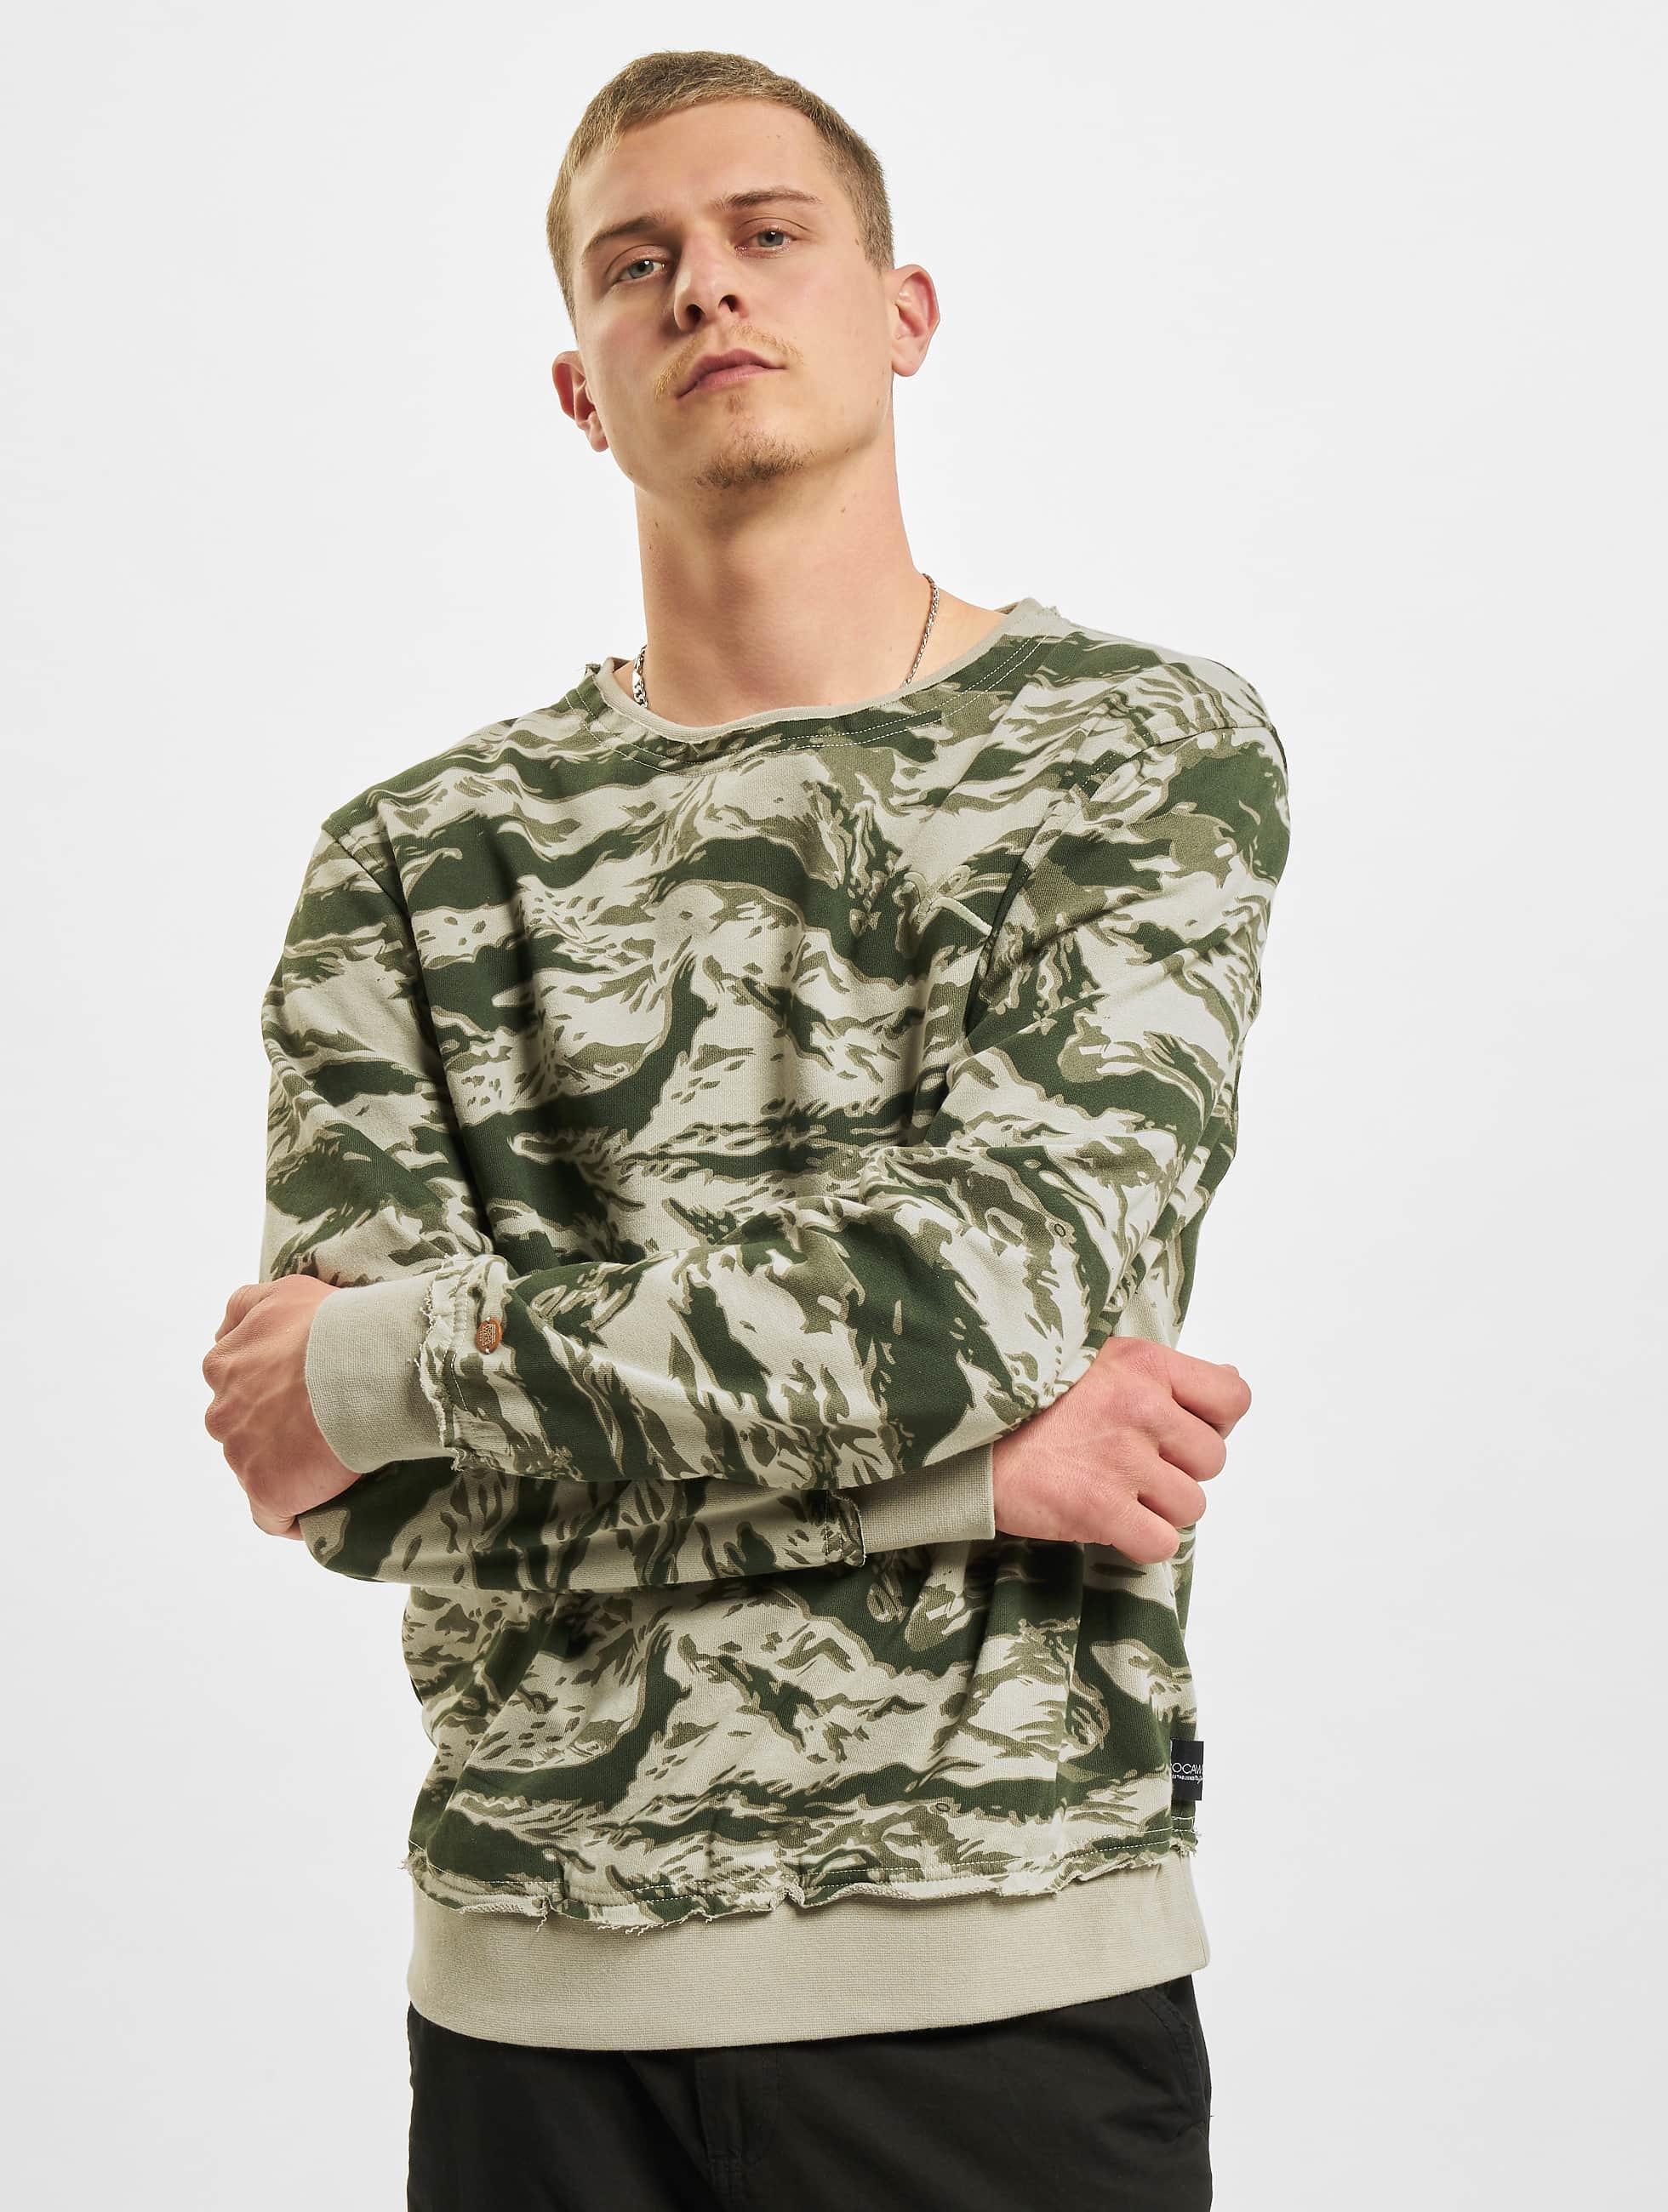 Rocawear Jumper Sweatshirt camouflage